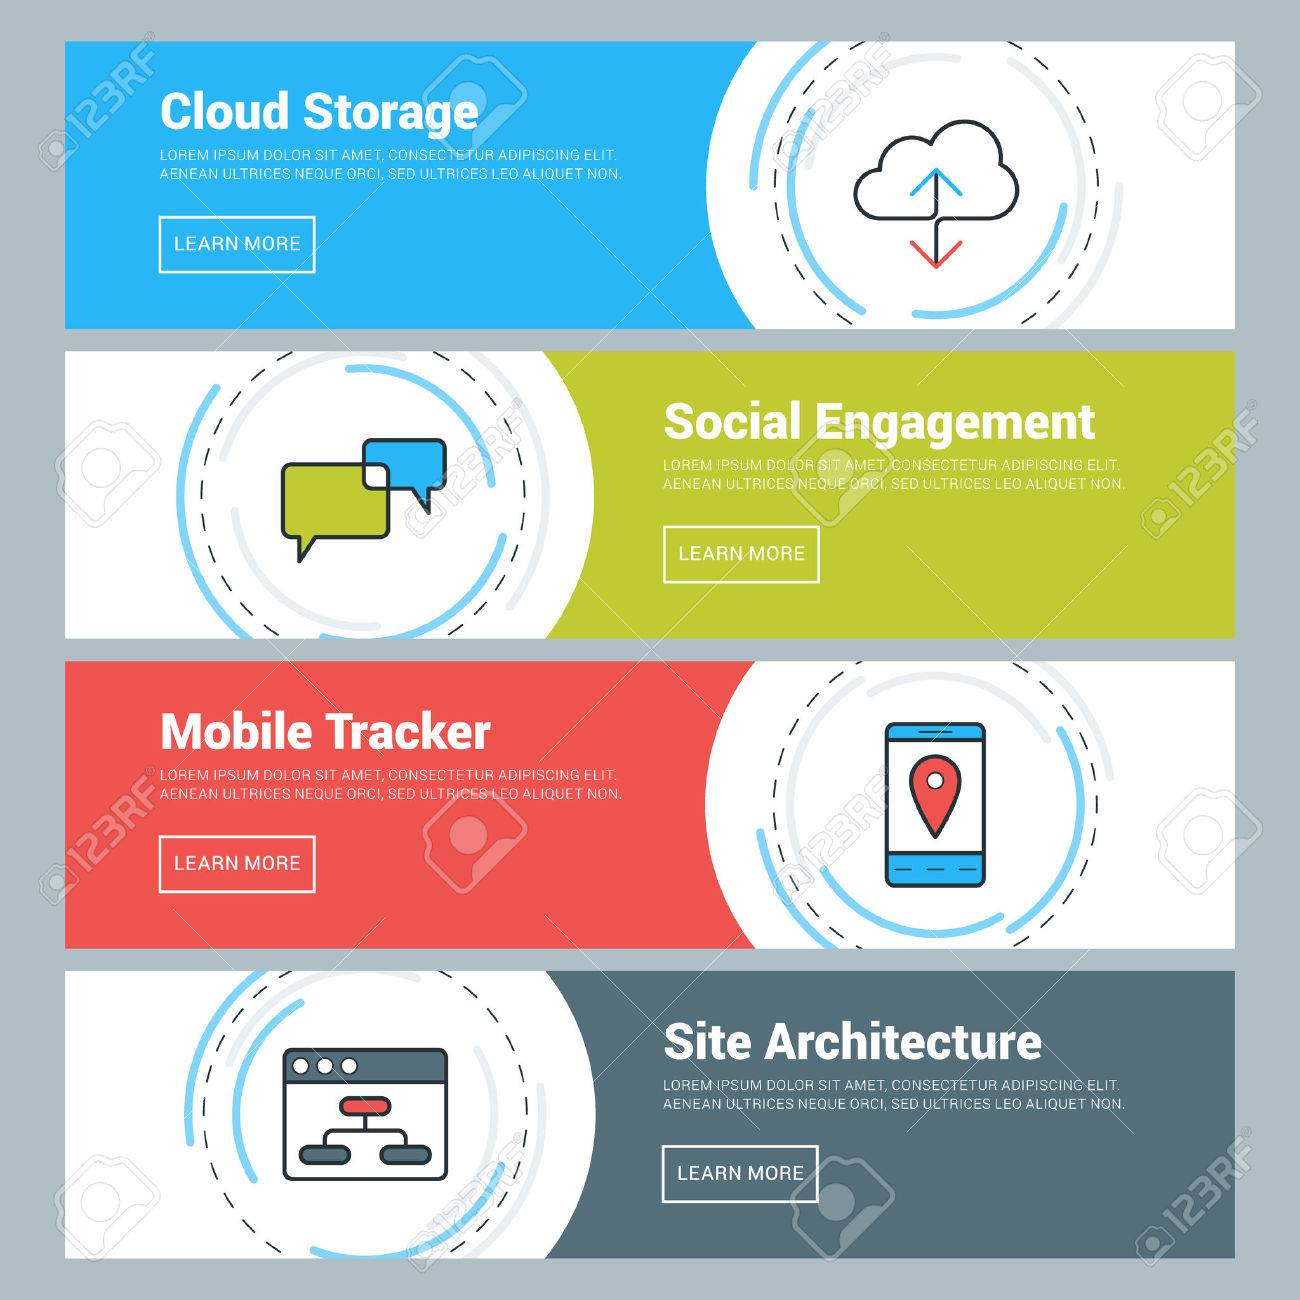 Flat Design Concept  Set of Vector Web Banners  Cloud Storage,